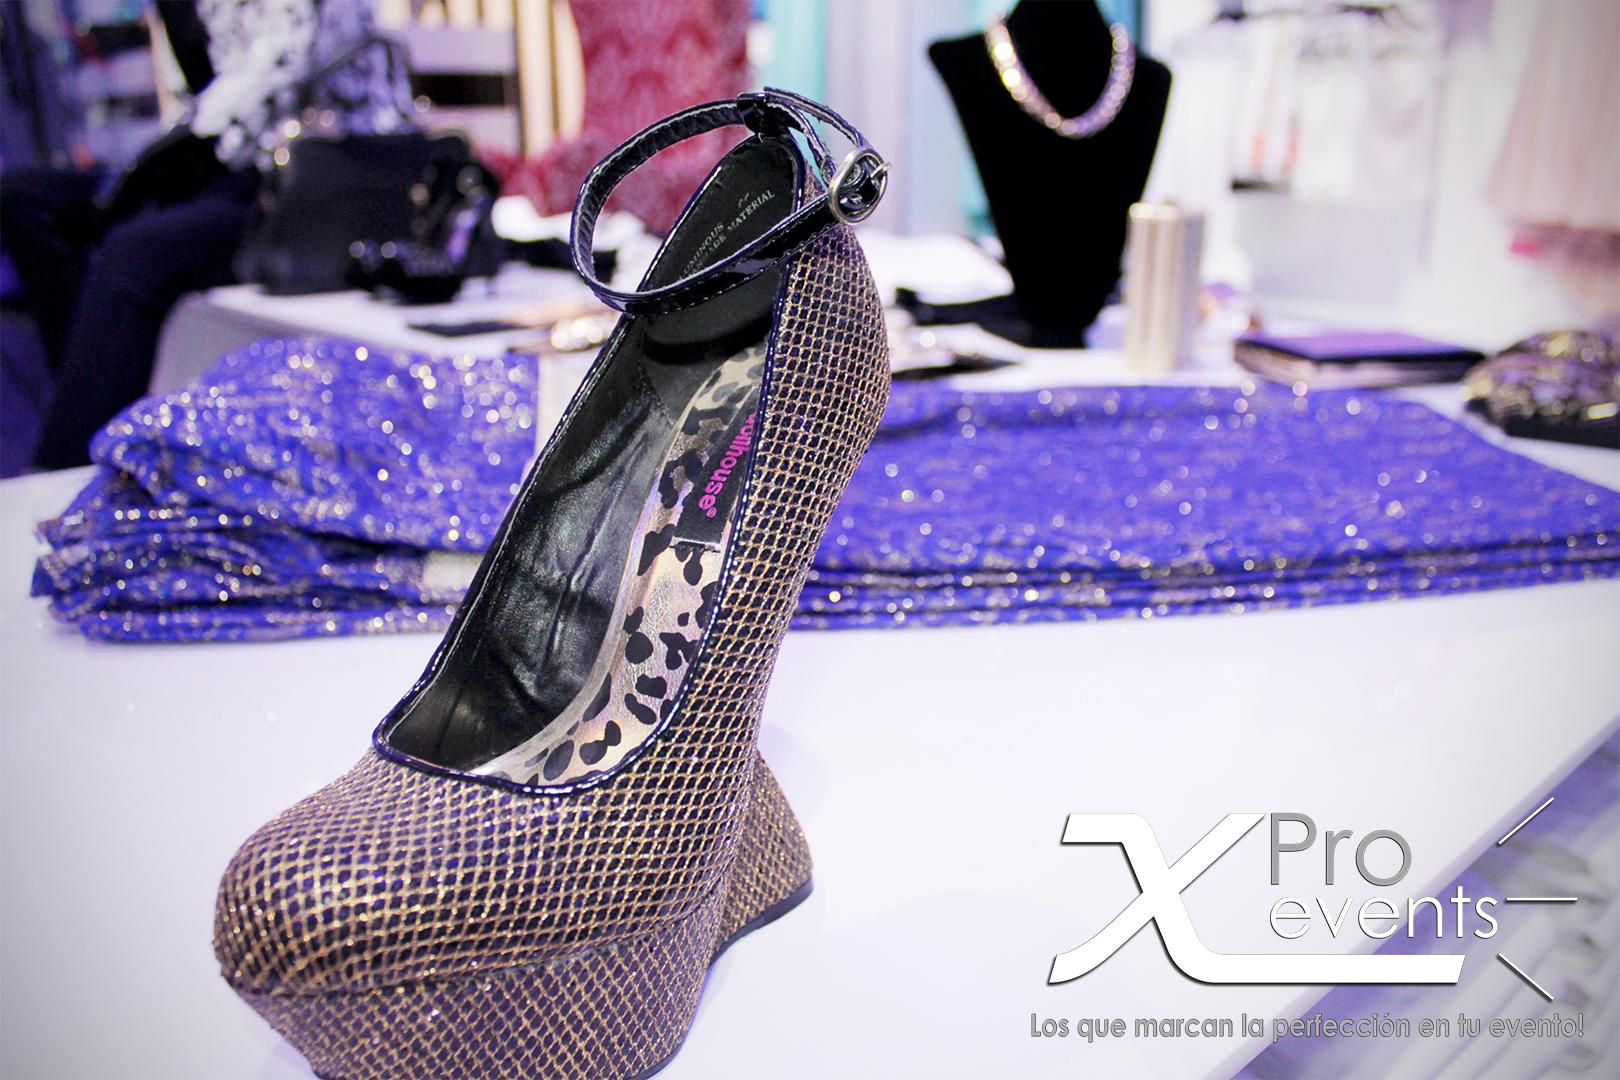 X Pro events_2014_12_04 - Inauguracion Clara VIP (10).png